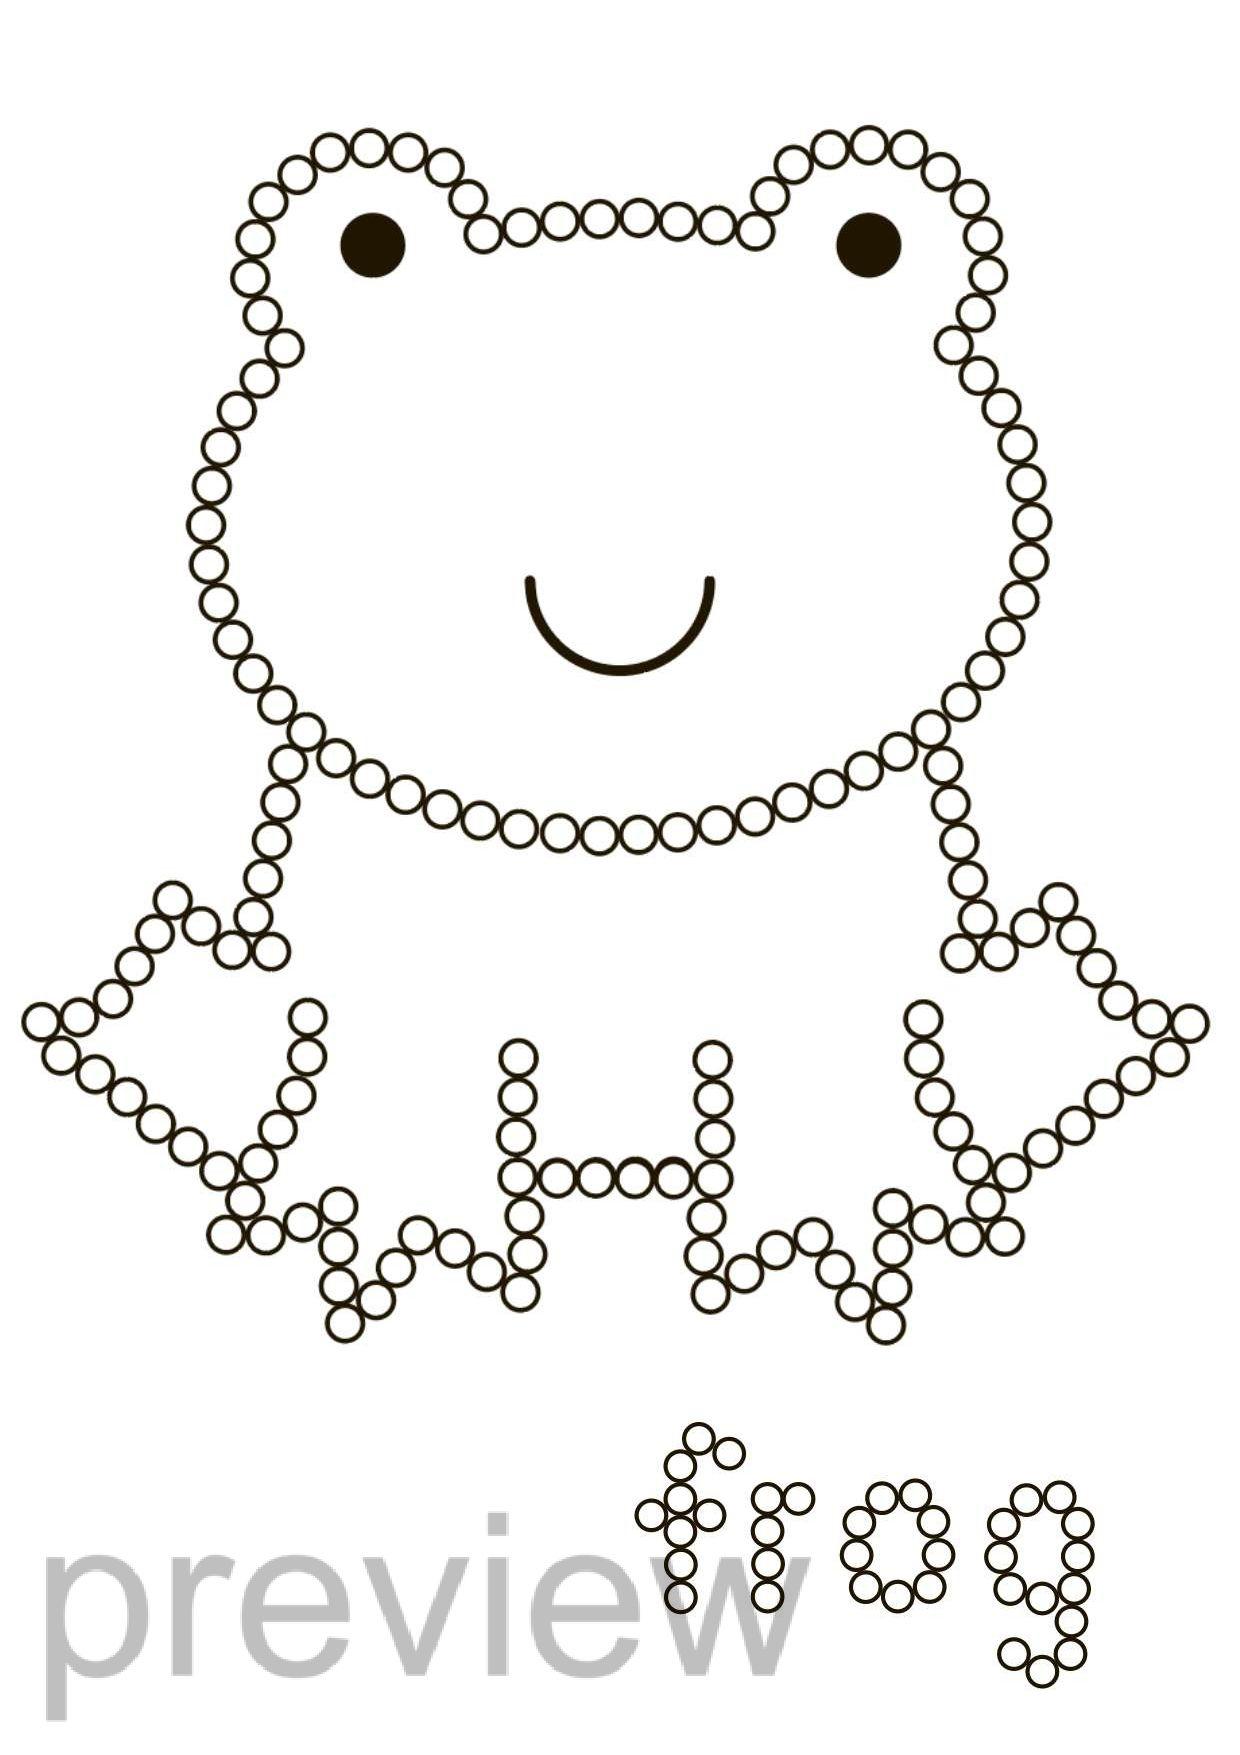 Q Tip Fine Motor Animals Dot Painting Worksheets Preschool Colors Dot Painting Preschool Activities [ 1755 x 1240 Pixel ]